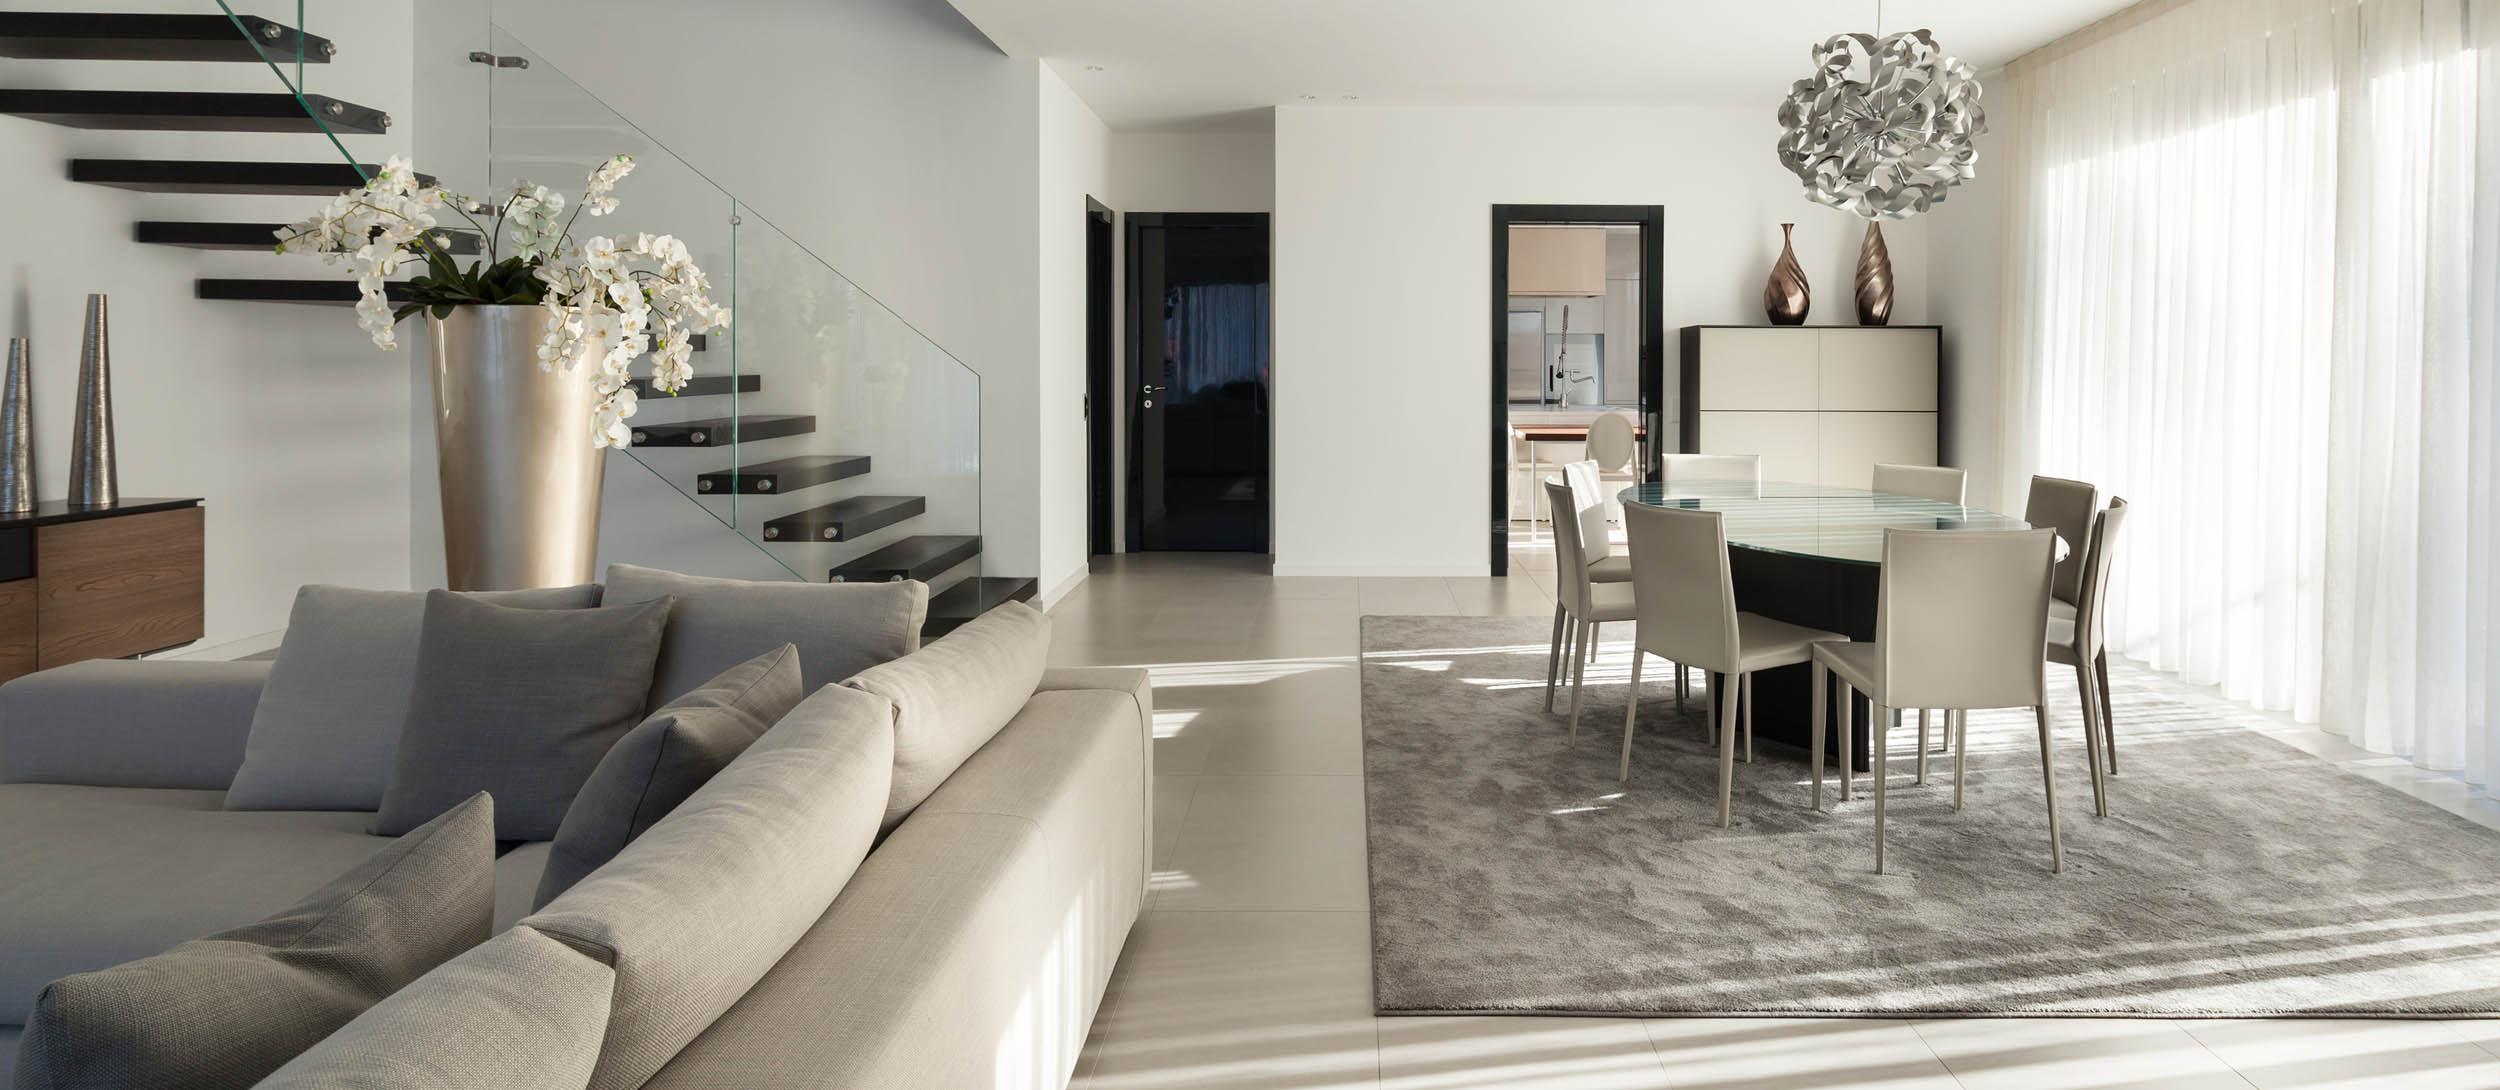 vendita di rivestimenti e pavimenti in ceramica